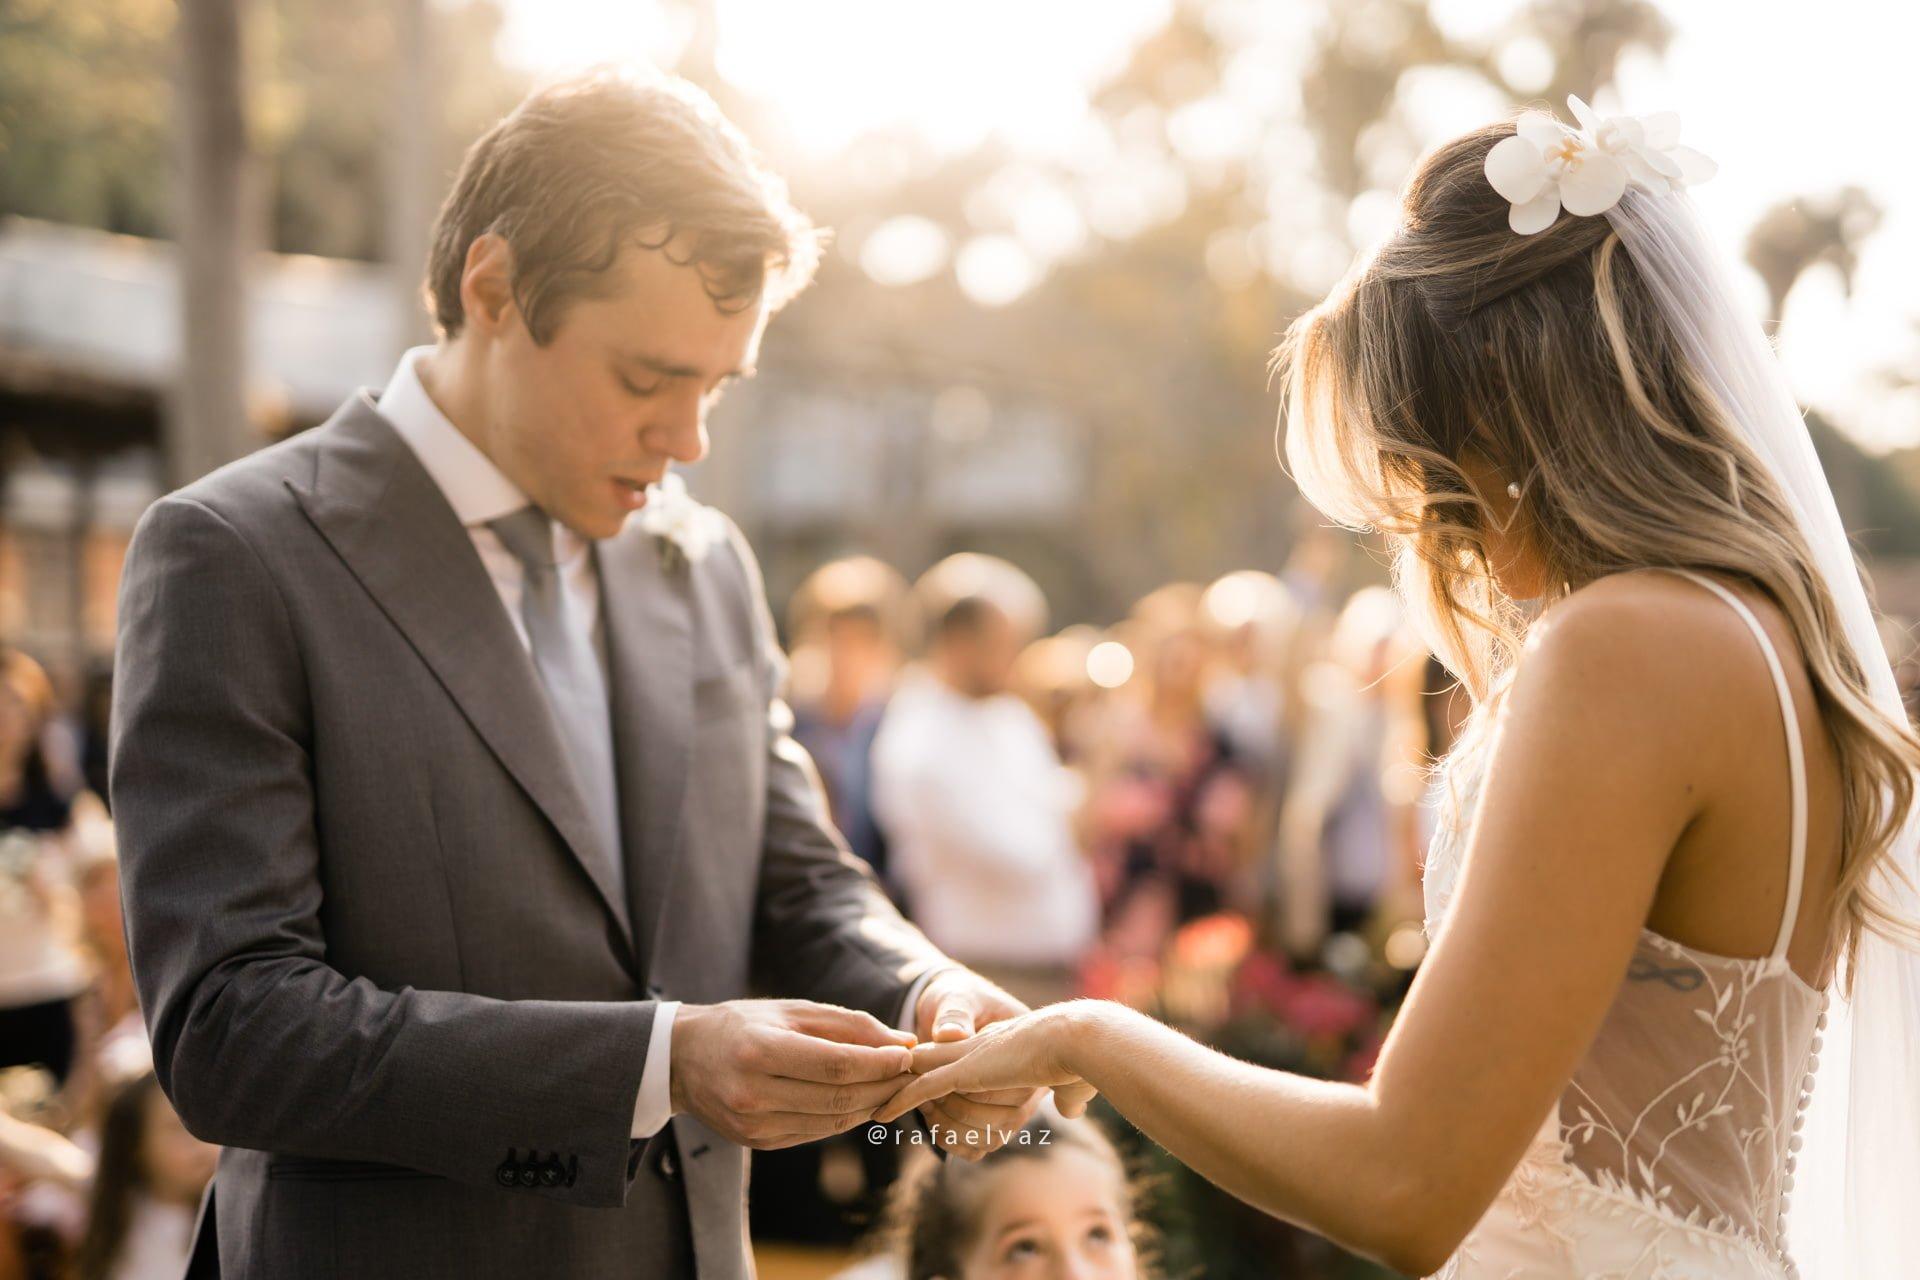 casamento julie e rafael, casamento na árvore, luz do sol no casamento, making of noiva, noiva, bride, bride to be, vestida de noiva, lapis de noiva, constance zahn